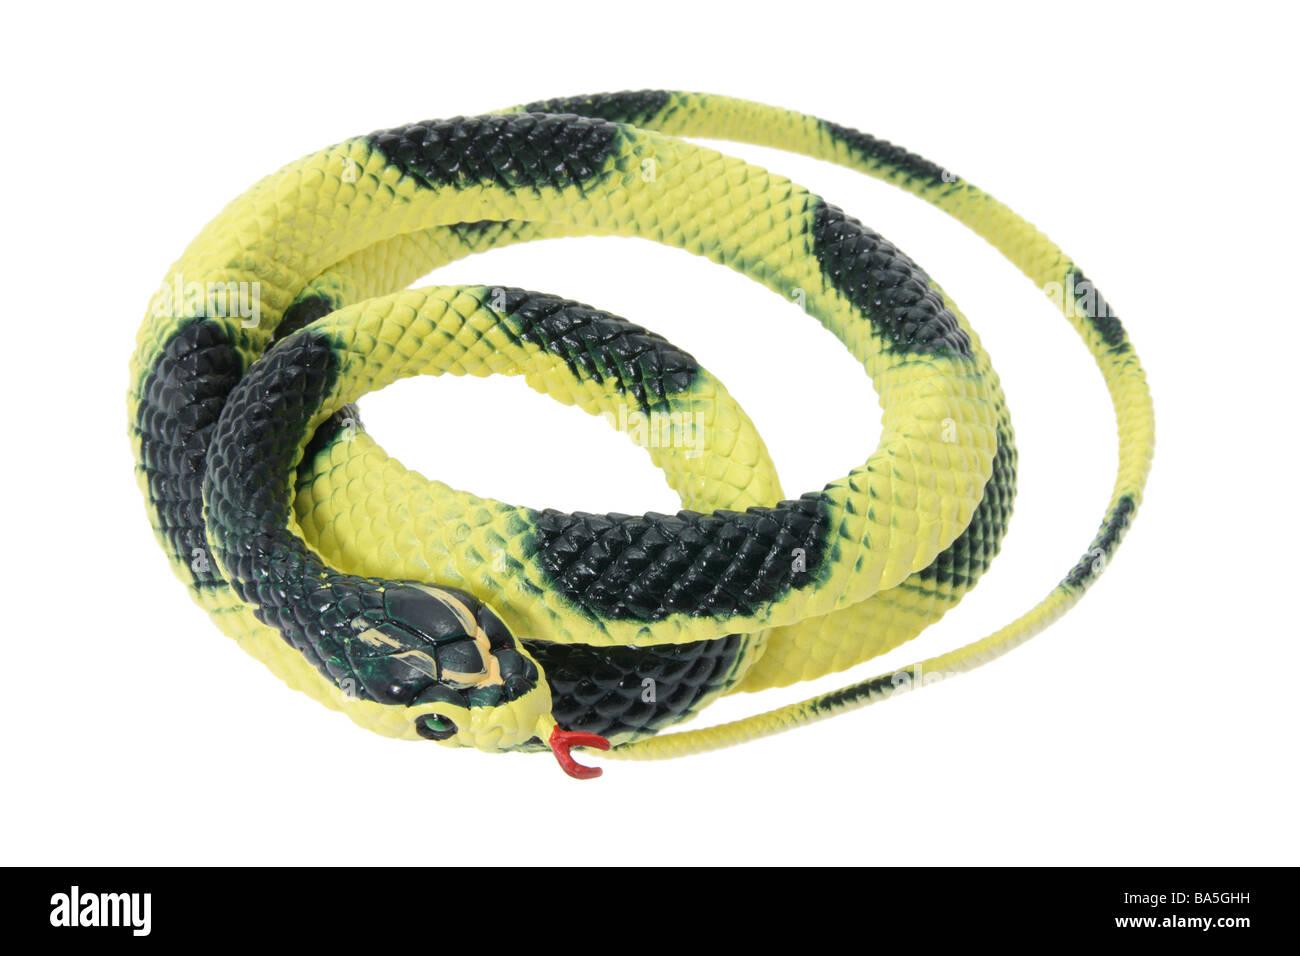 Rubber Snake - Stock Image